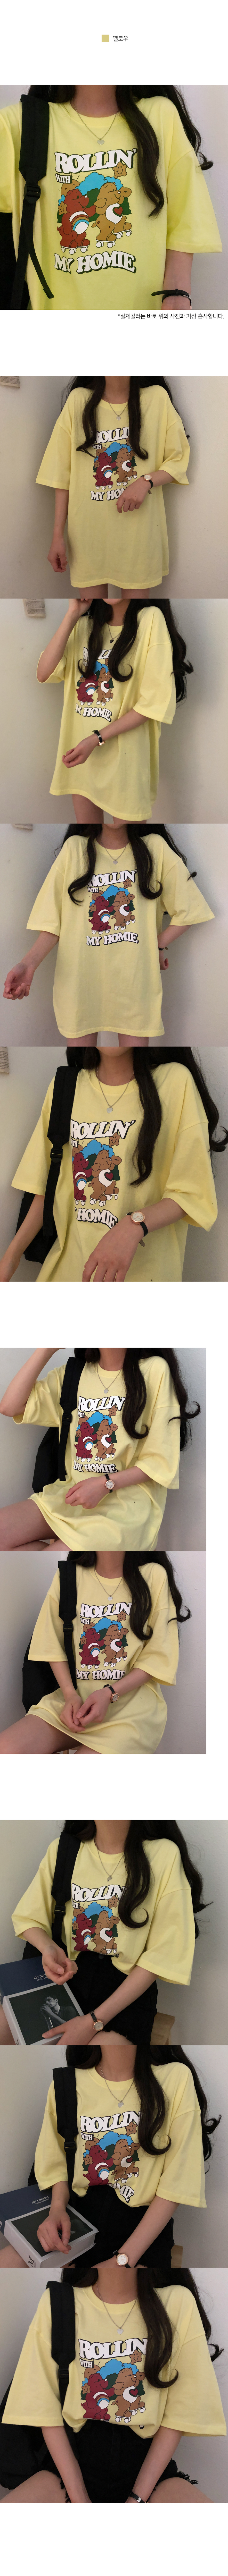 Homy Printed Bear Overfit Short Sleeve T-Shirt